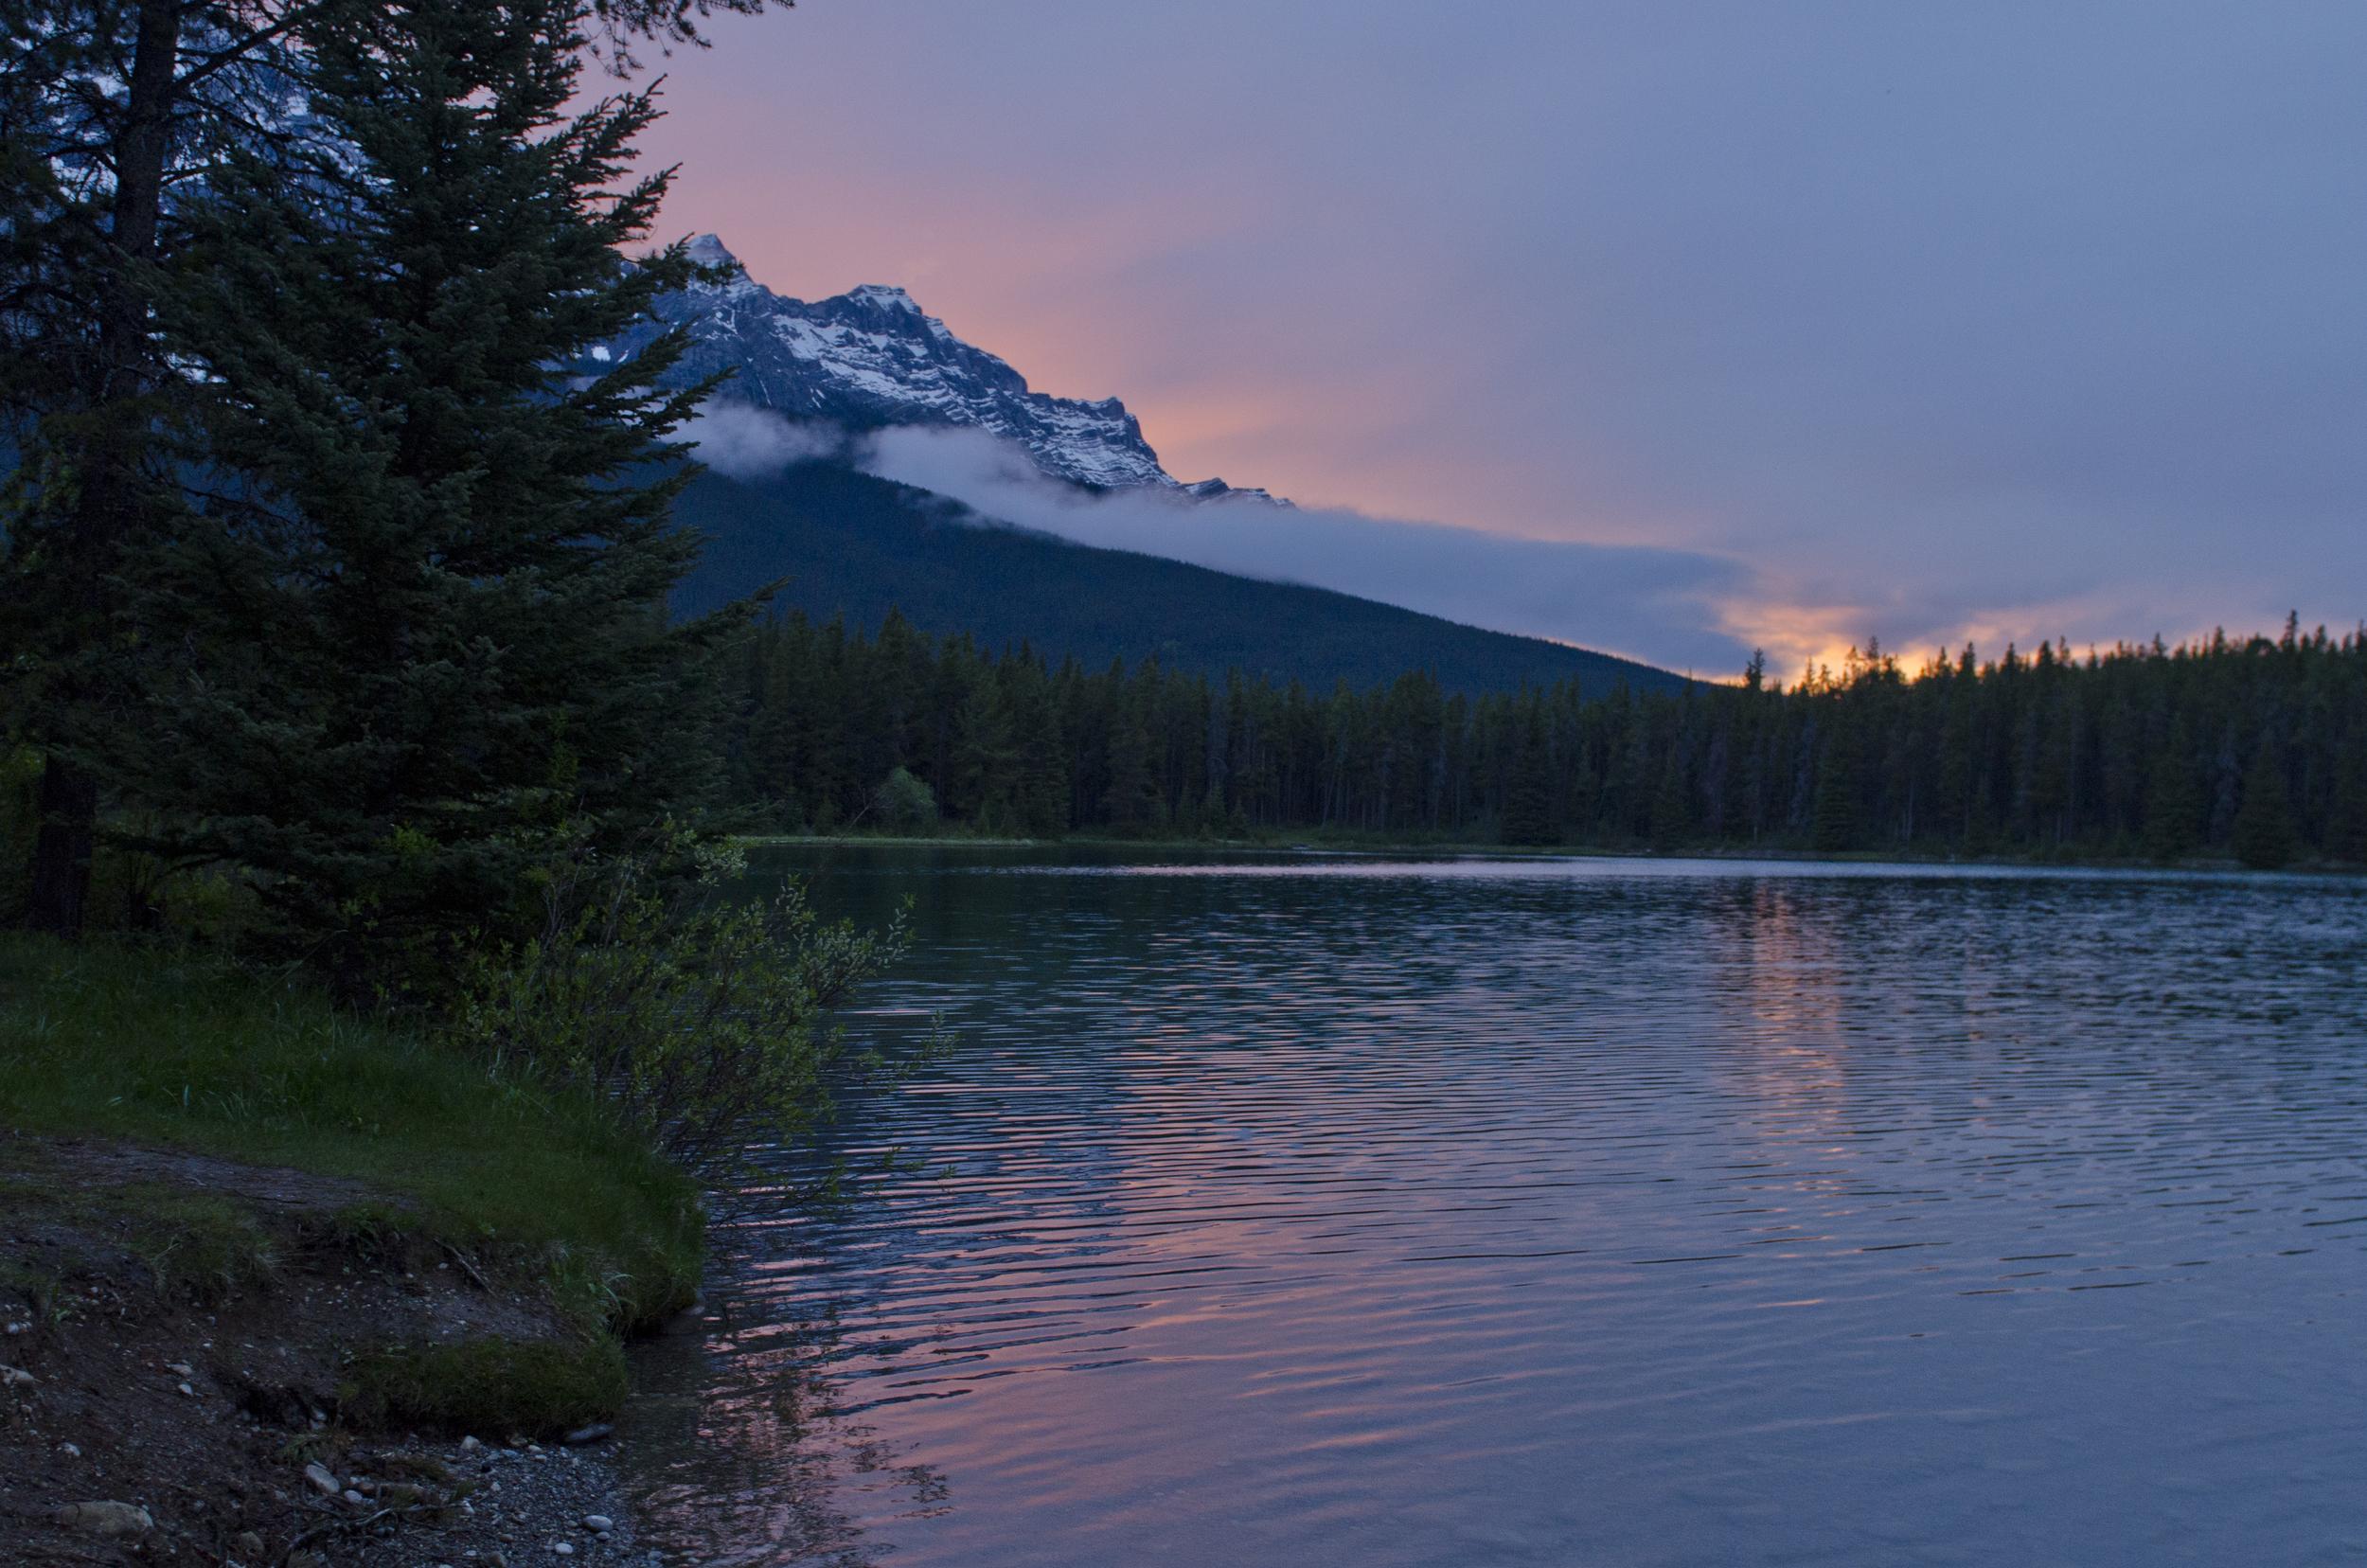 Sunset over Two Jack Lake